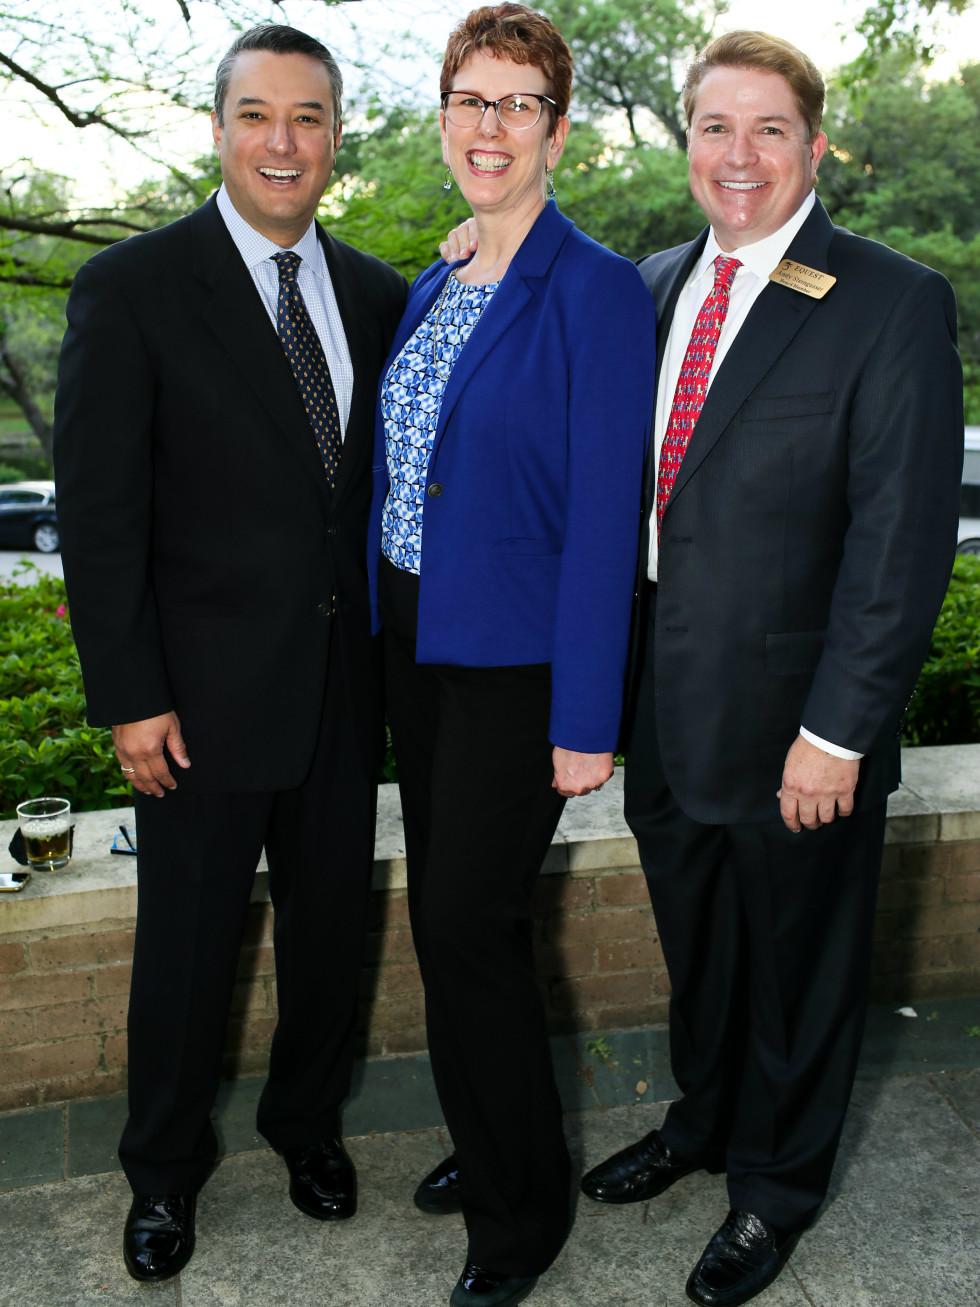 Paul Valdez, Michele Ritter, Andy Steingasser